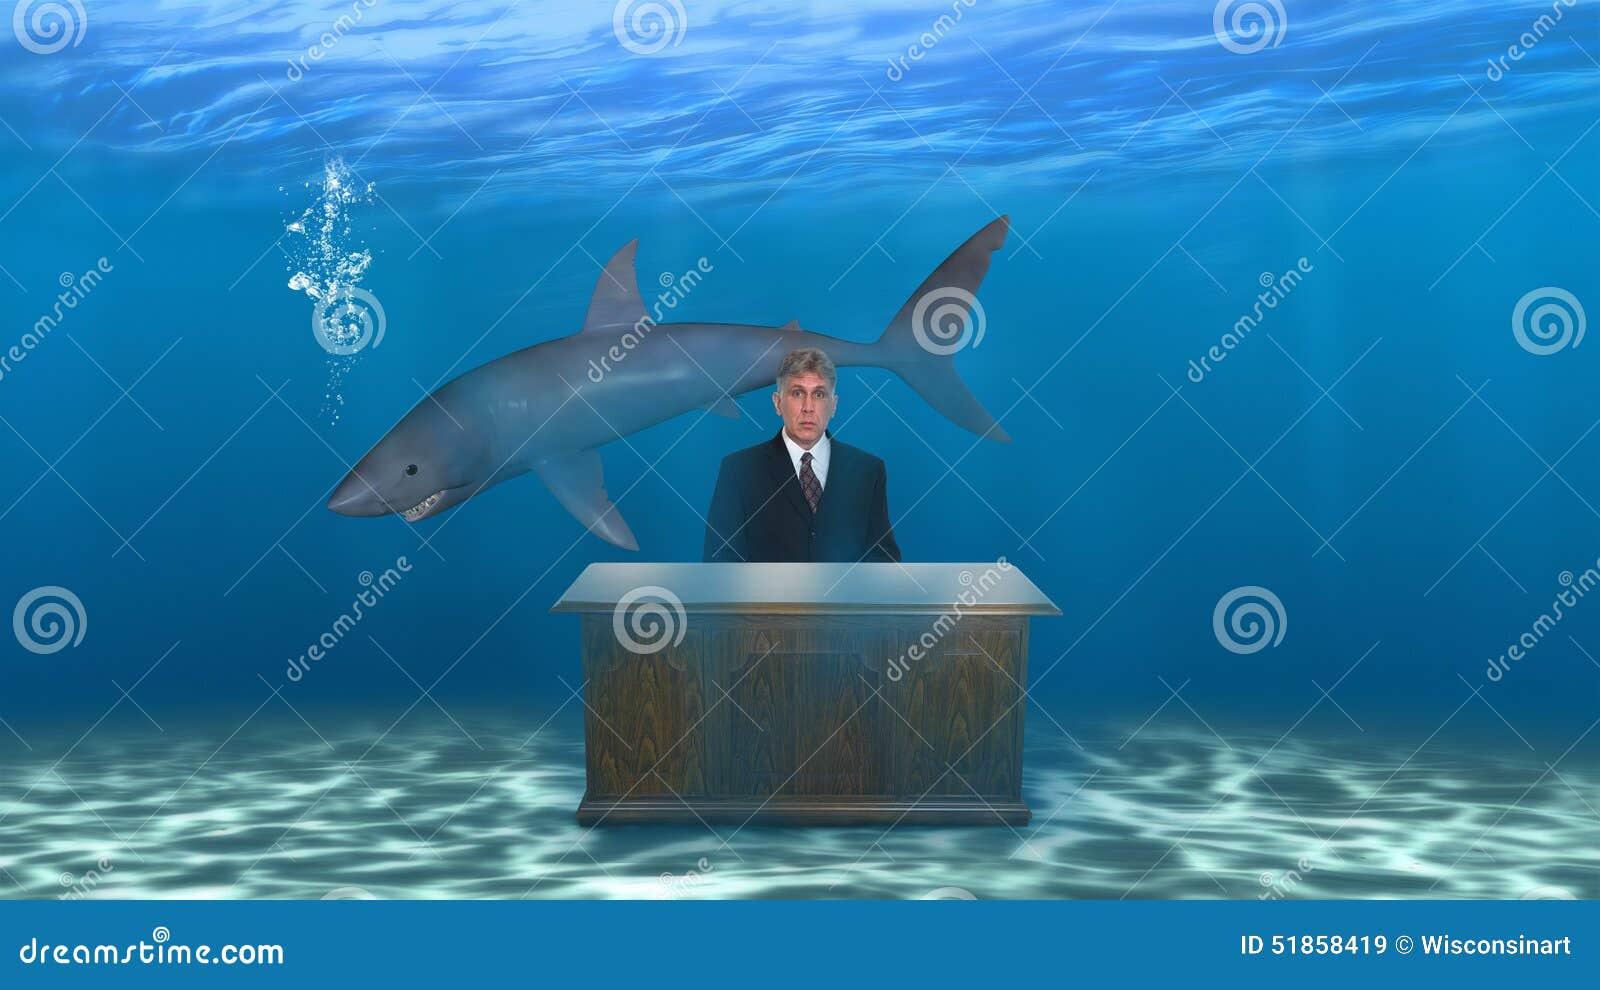 Business, Lawyer, Sales, Marketing, Politician